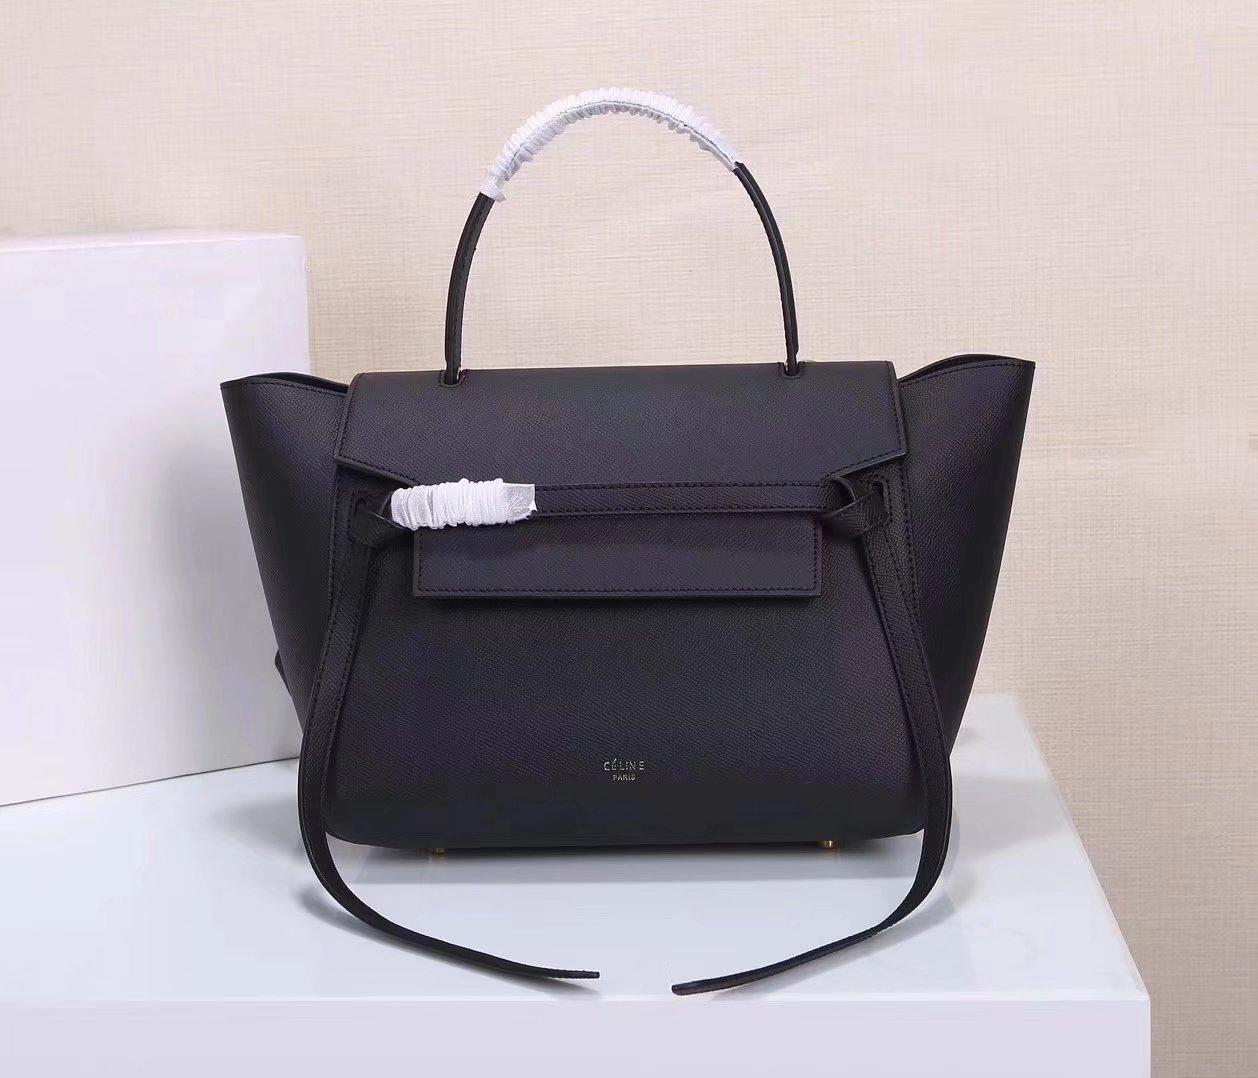 Celine Women Mini Belt Bag in Grained Calfskin Leather Black